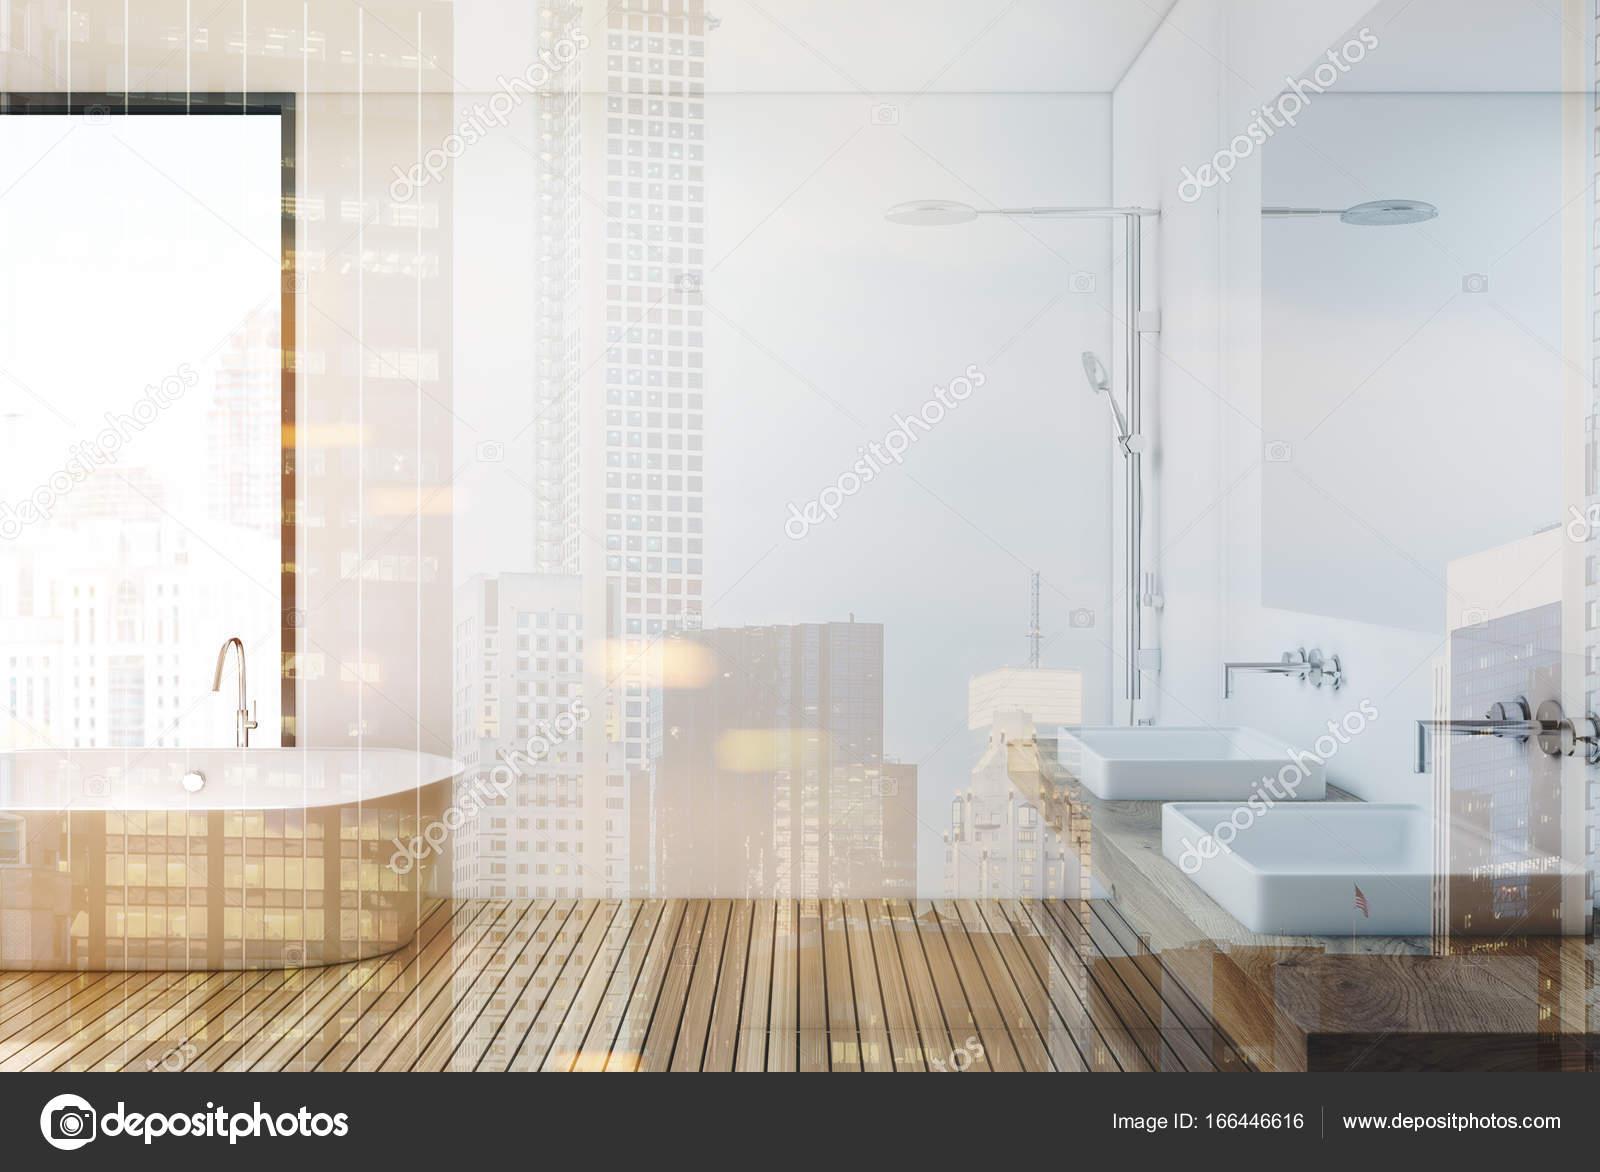 Badkamer Douche Vloeren : Houten vloer badkamer en douche kant toned u stockfoto